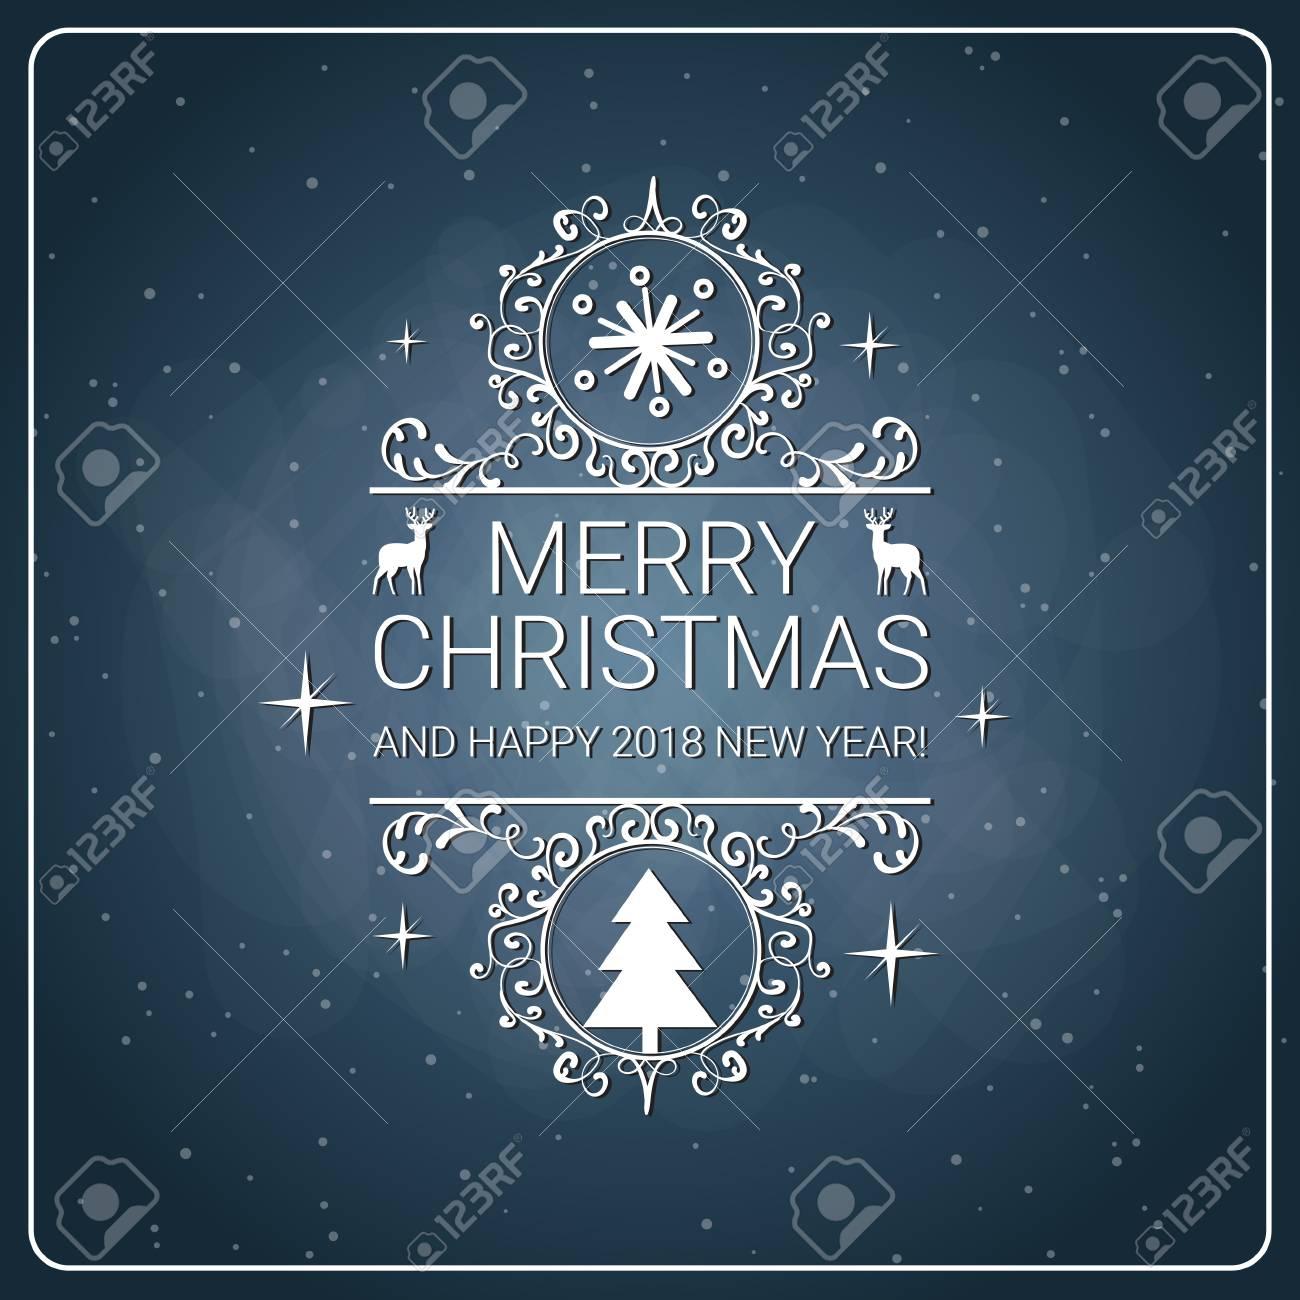 Merry Christmas Poster 2018.Merry Christmas Poster Retro Style On Chalkboard Background New